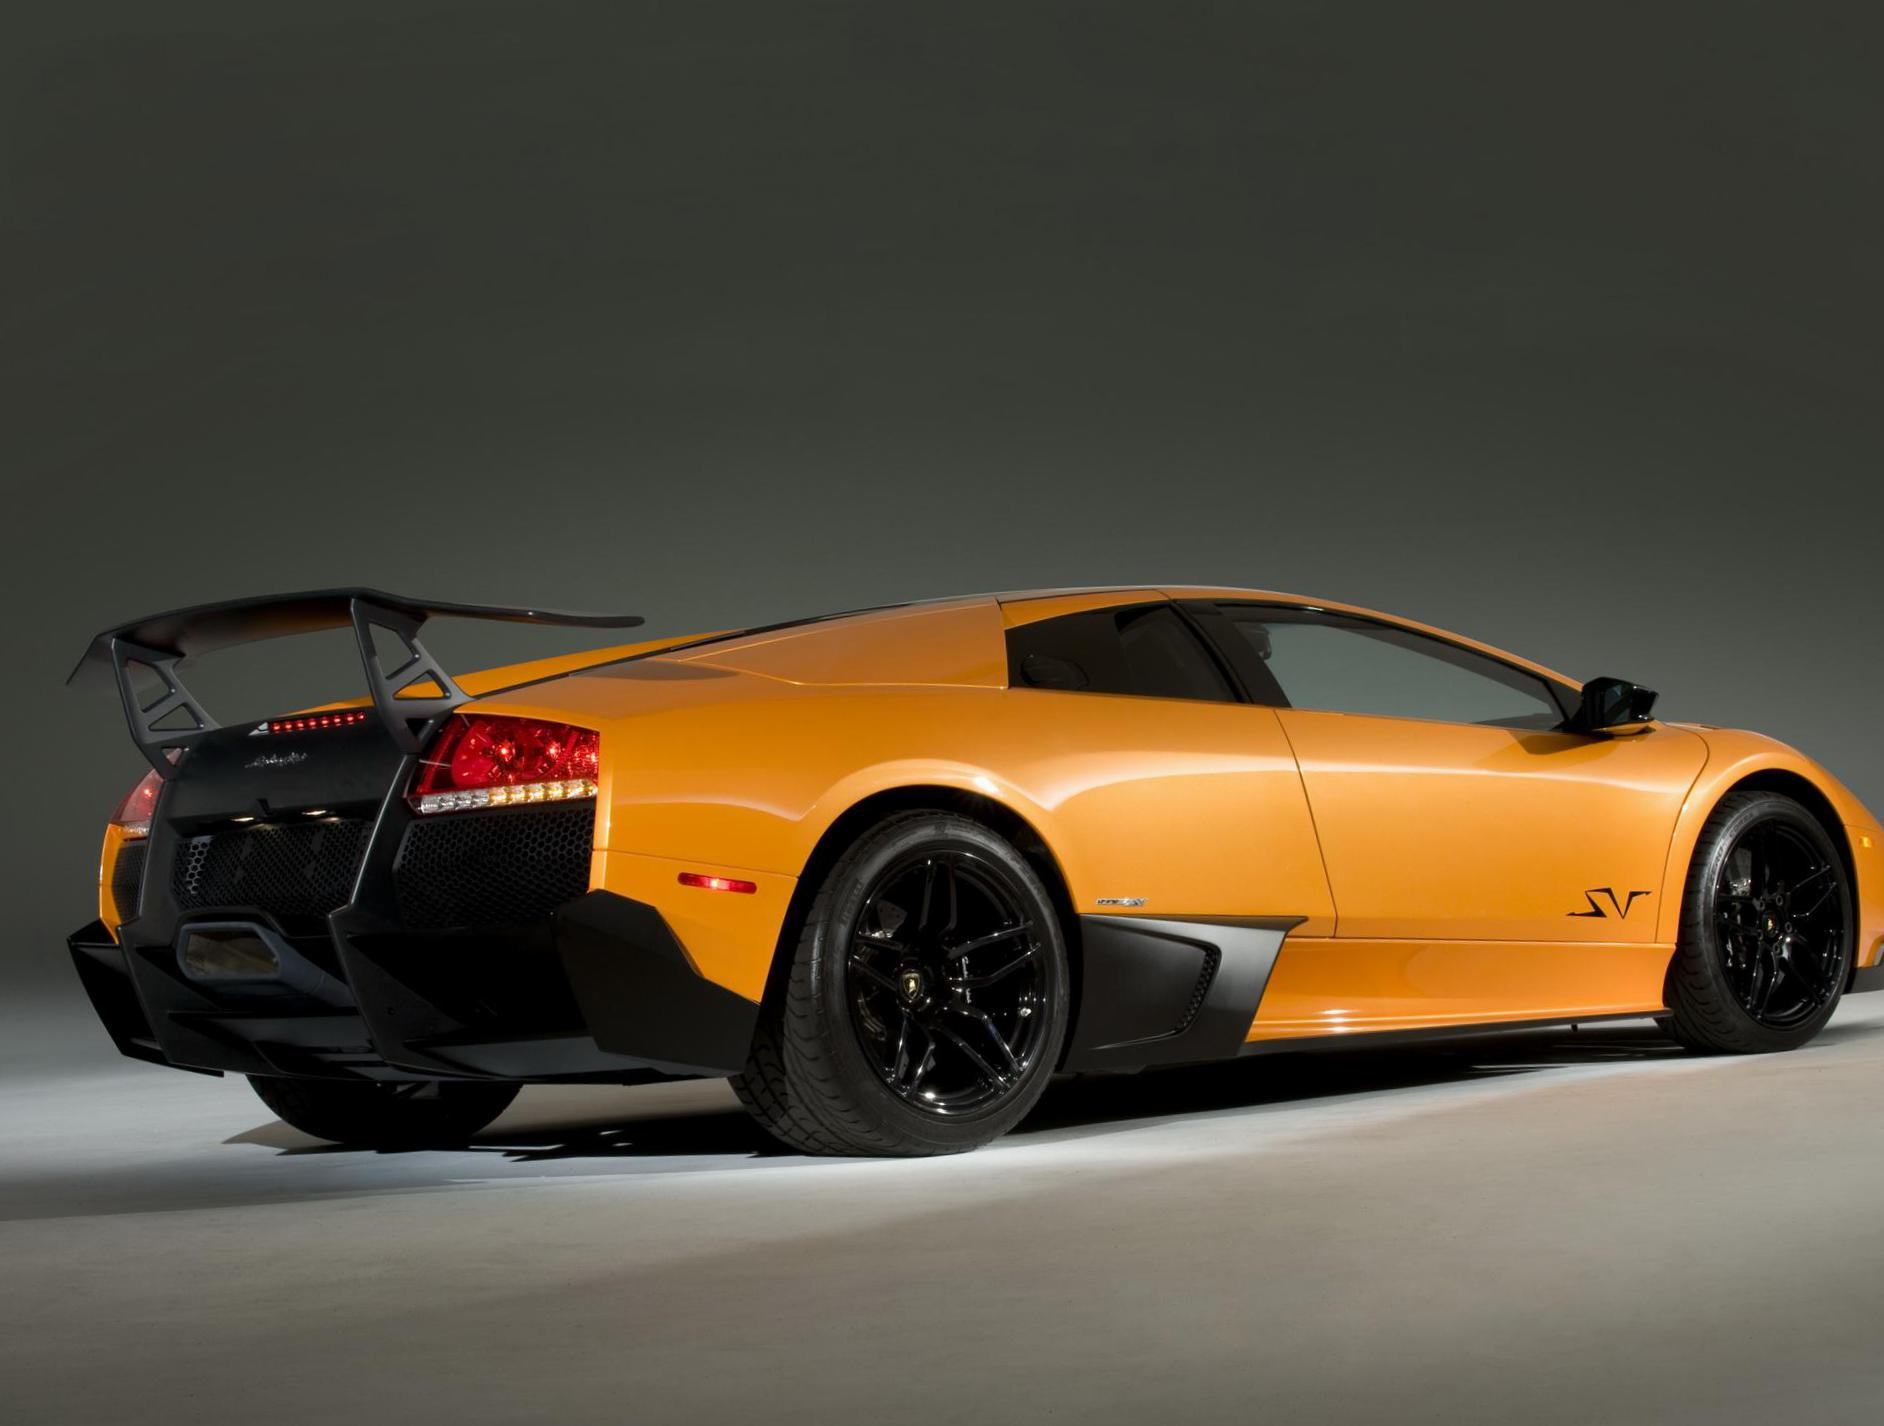 Lamborghini Murcielago LP 670 4 SuperVeloce For Sale Minivan